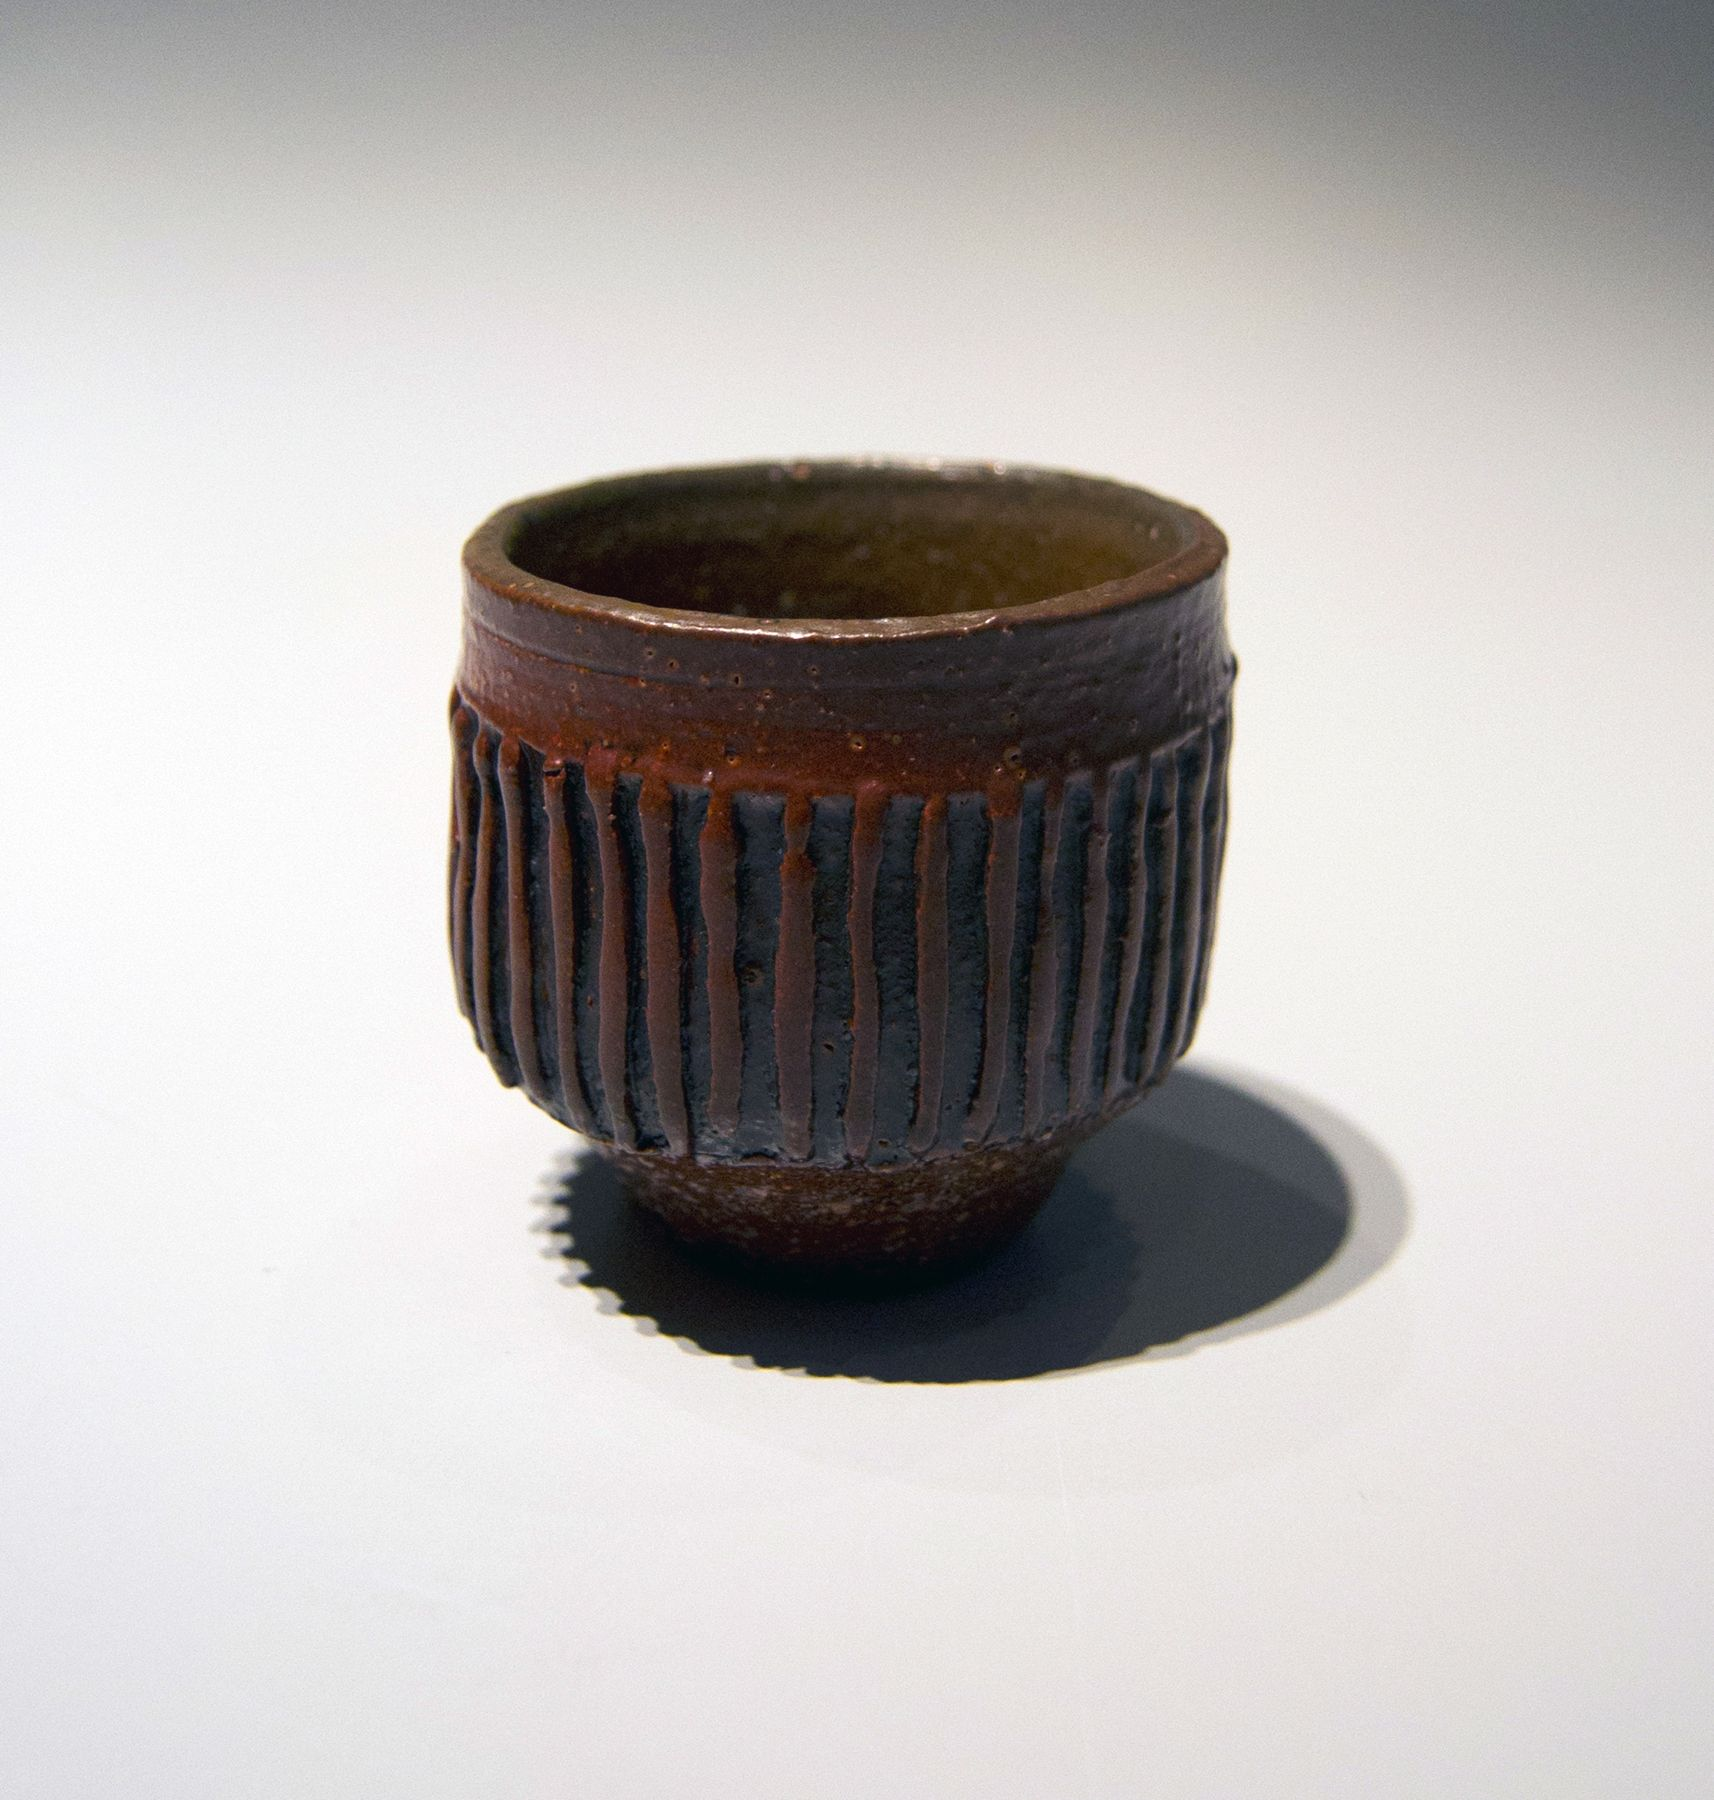 Ichino Masahiko (b. 1961), Small footed sake cup with raised, striped patterning